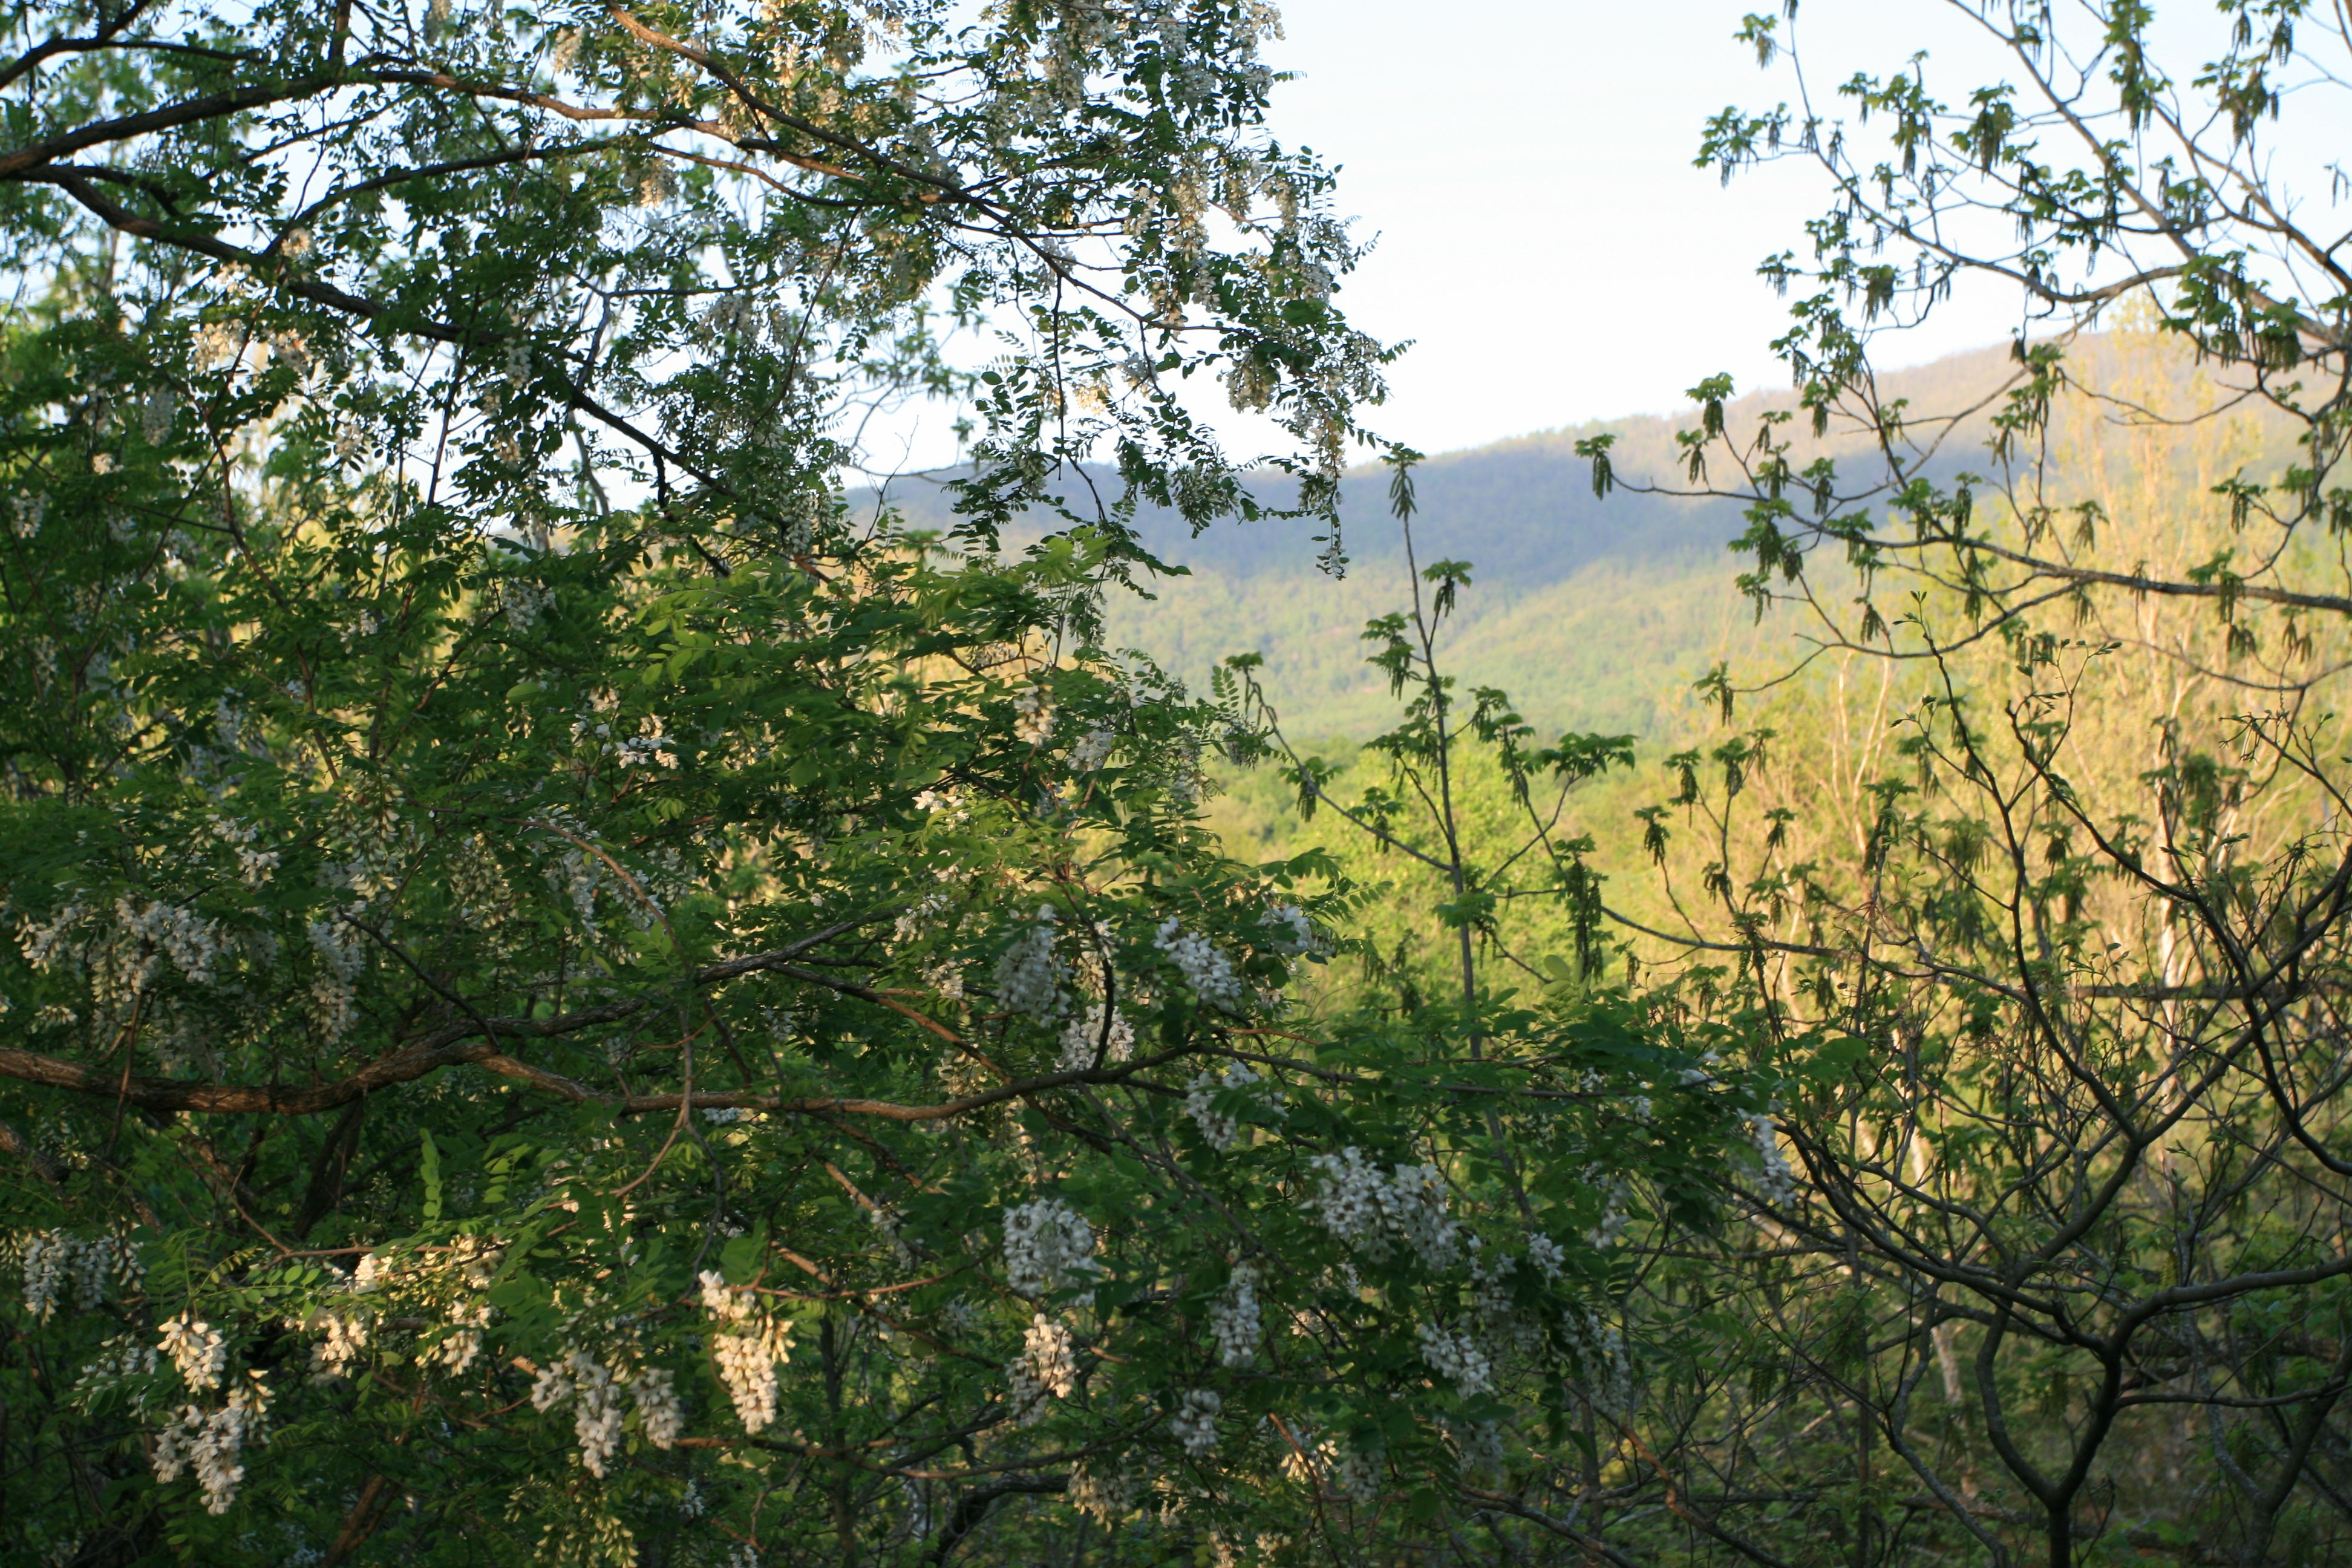 Black Locust Tree, A Native Virginia Tree Is An Ancient